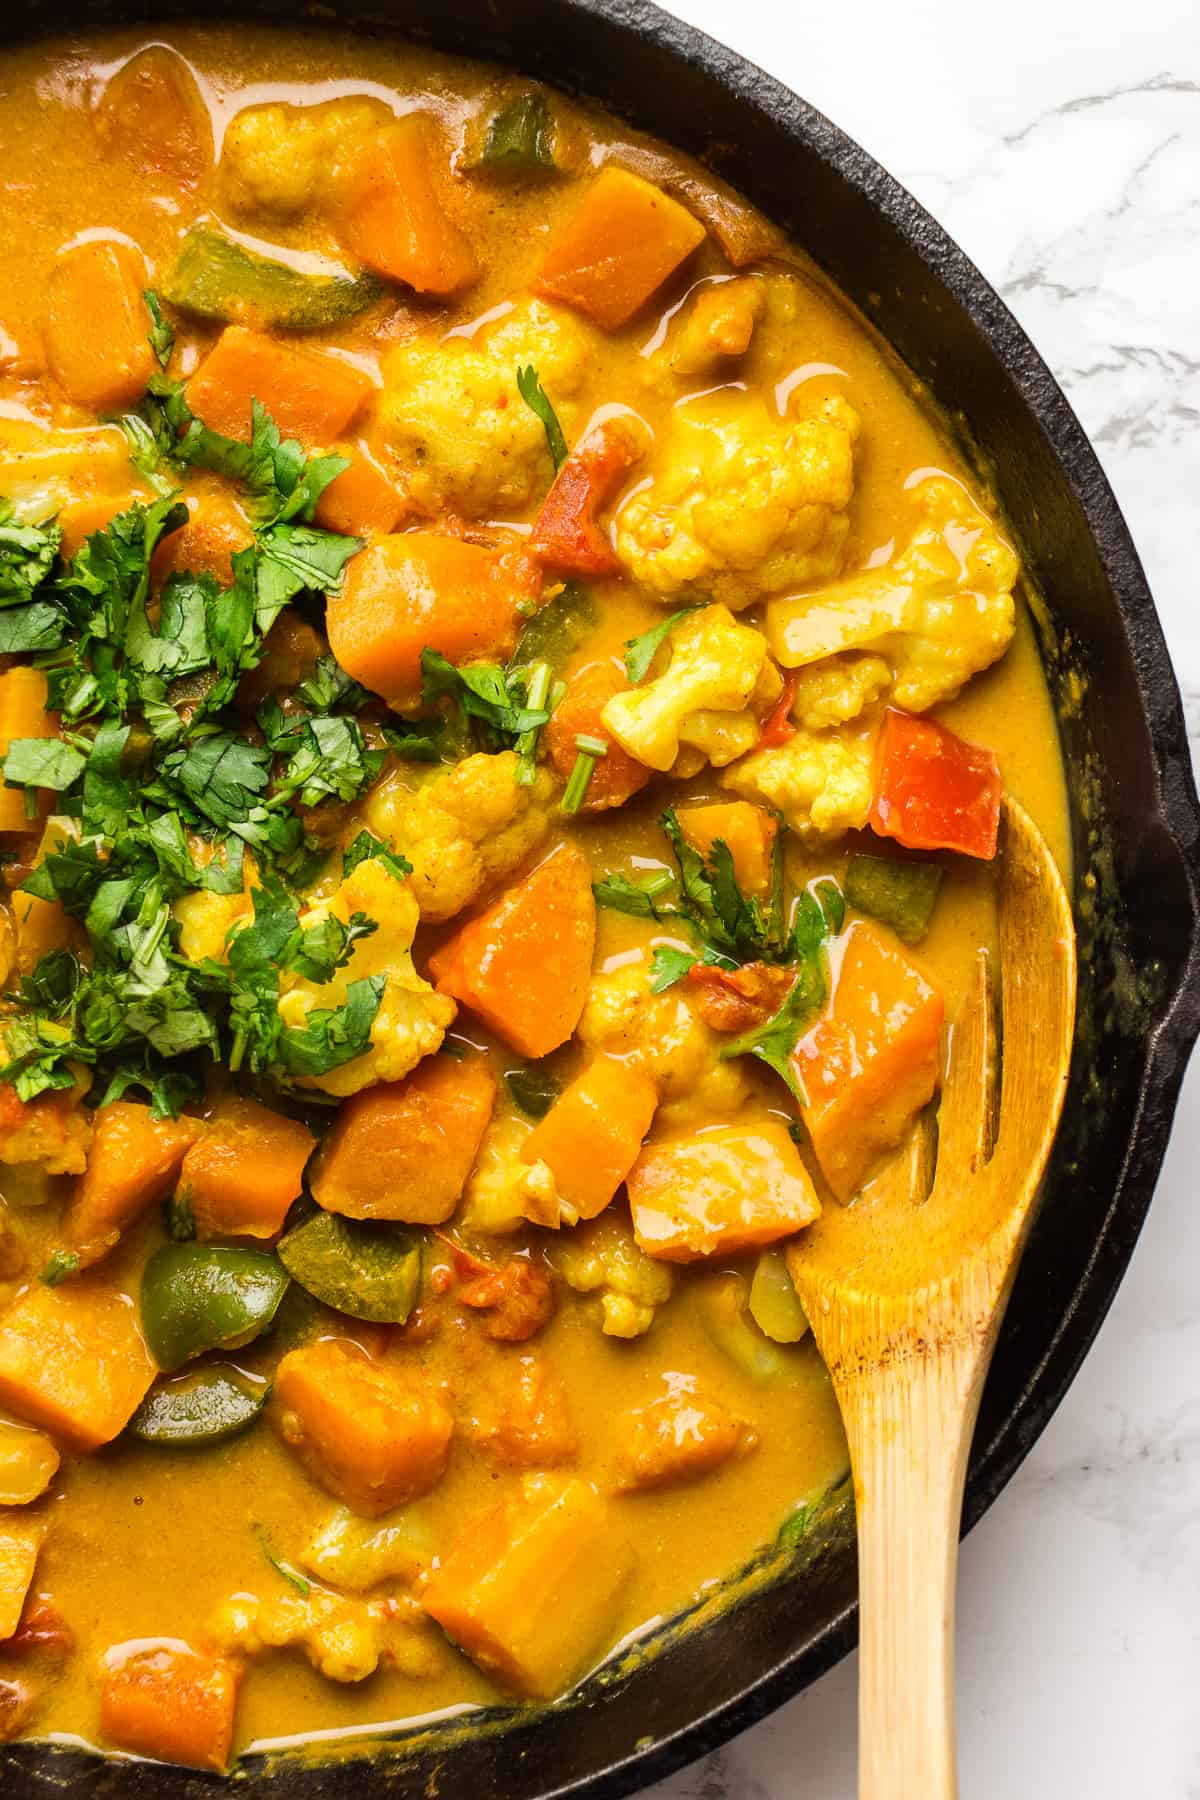 Cozy butternut squash stew